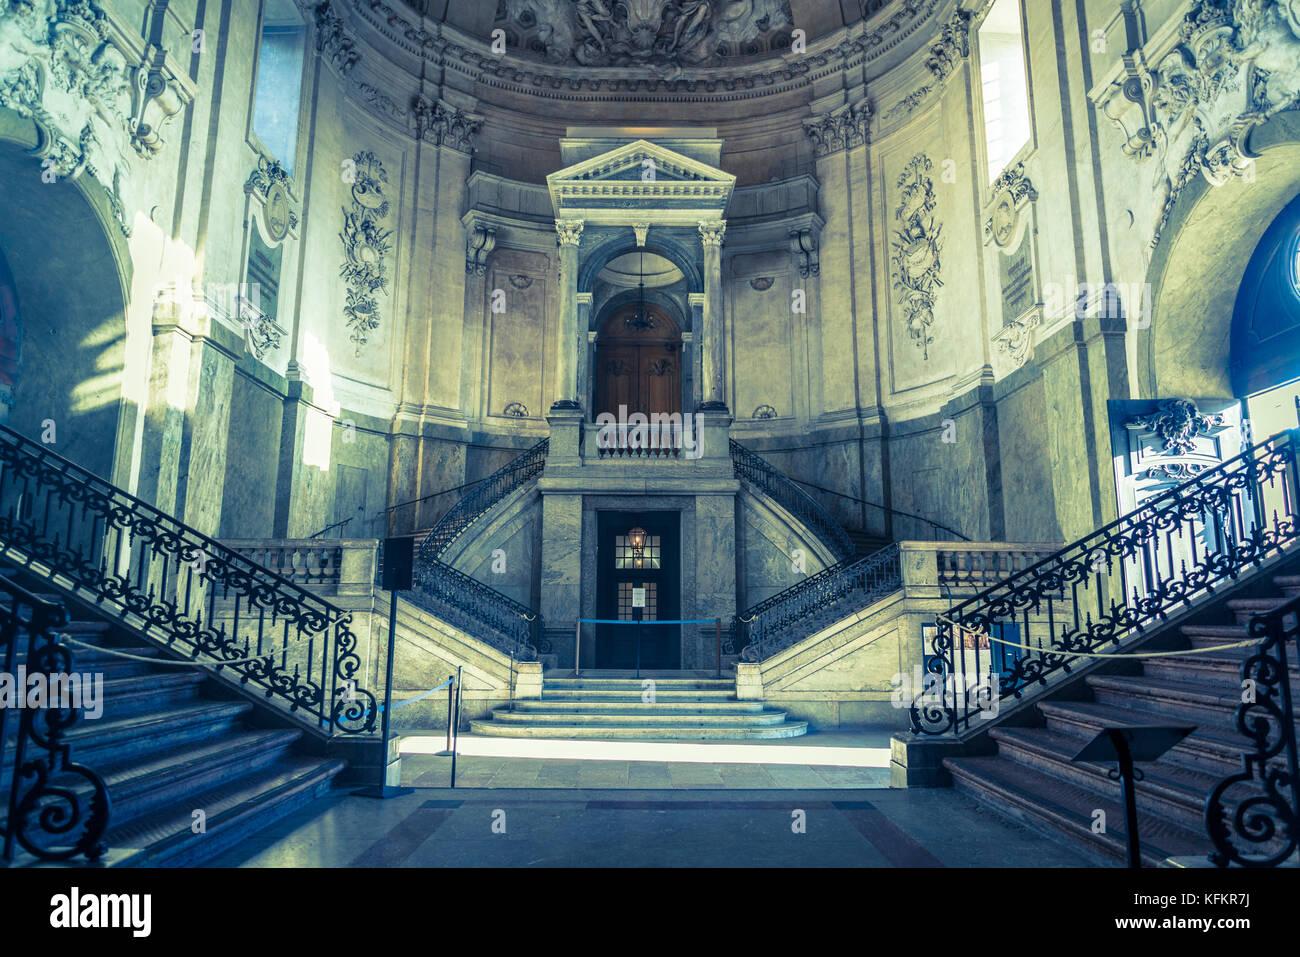 Entrance Hall Domed-entrance-hall-of-the-royal-palace-or-kungliga-slottet-gamla-KFKR7J